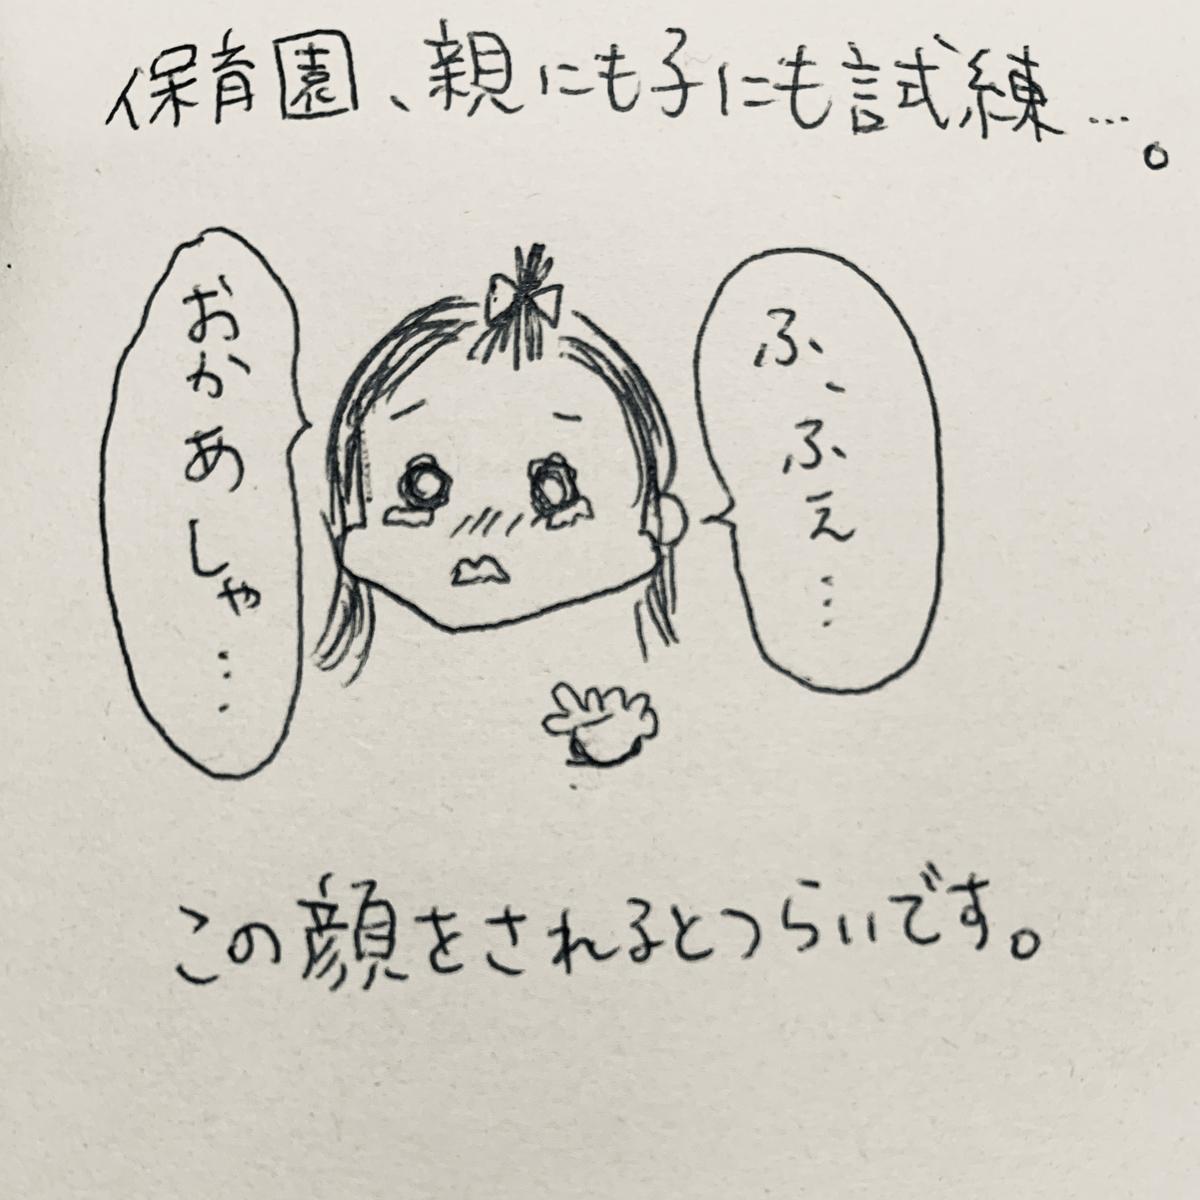 f:id:nananan0:20190410120126j:plain